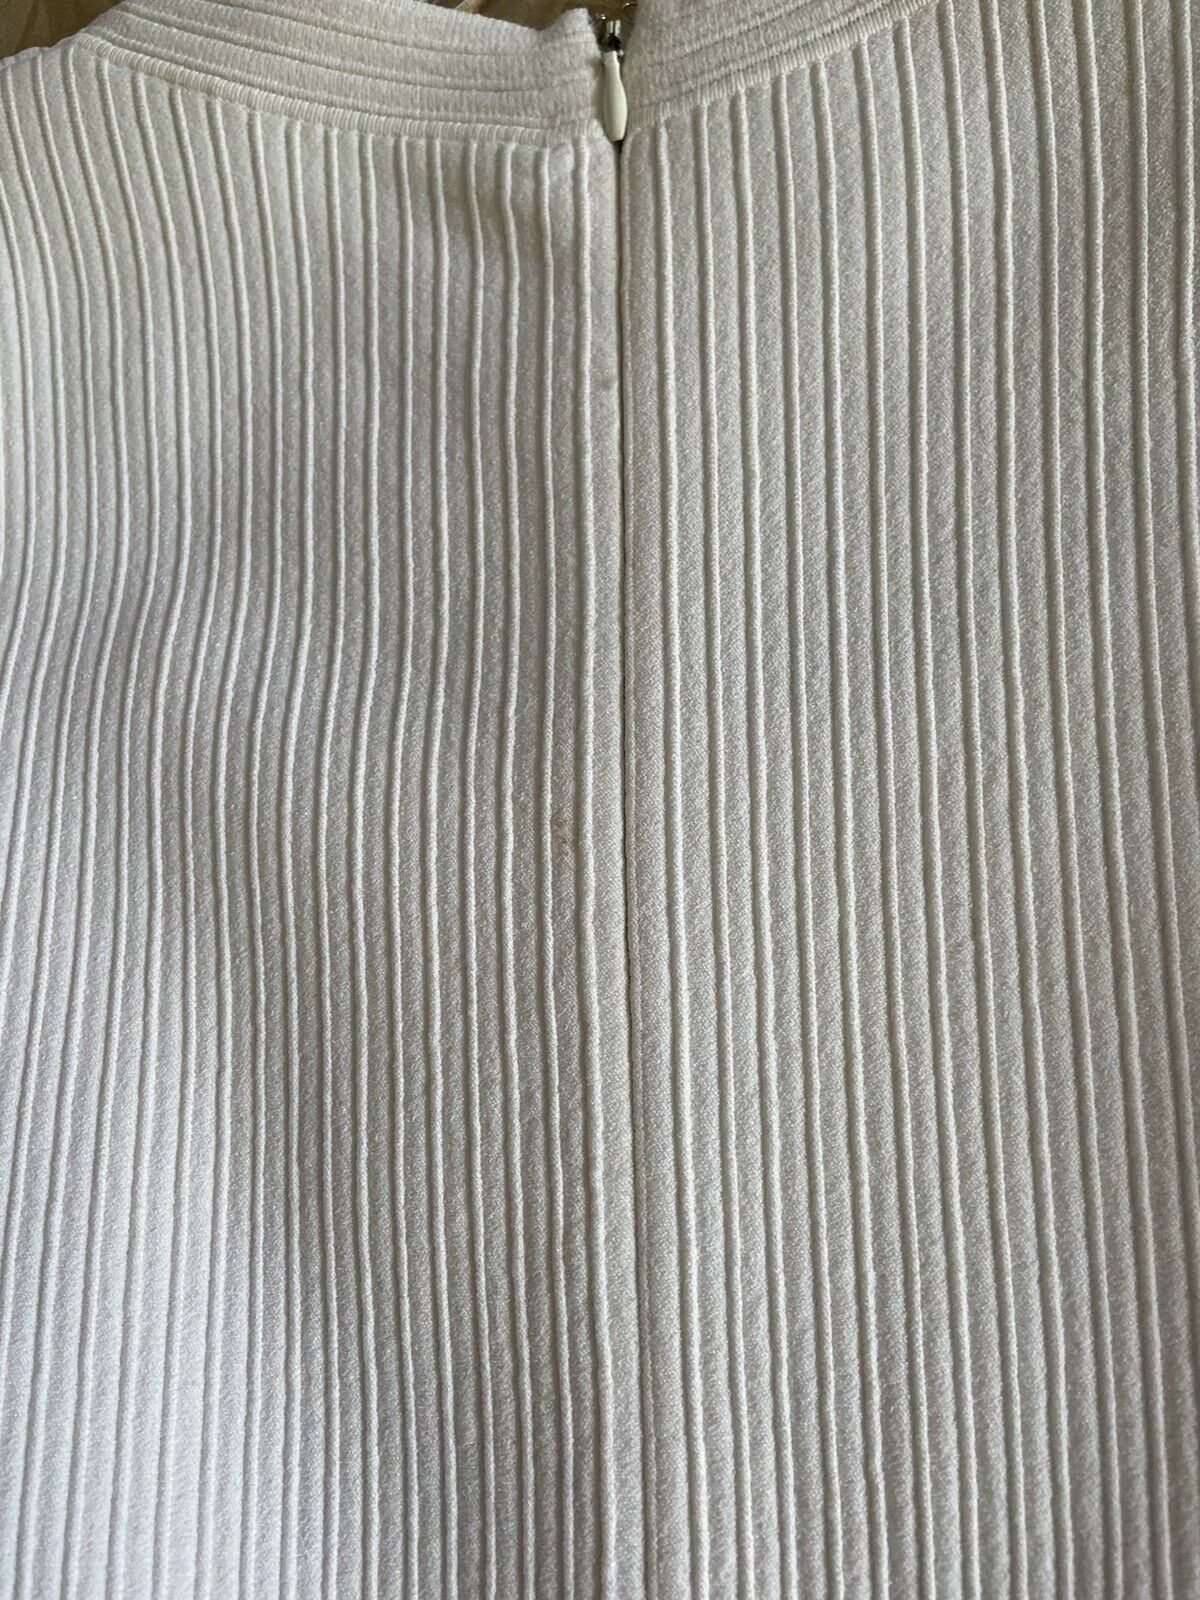 Azzedine Alaia White Long Sleeve Top Blouse Dress… - image 12